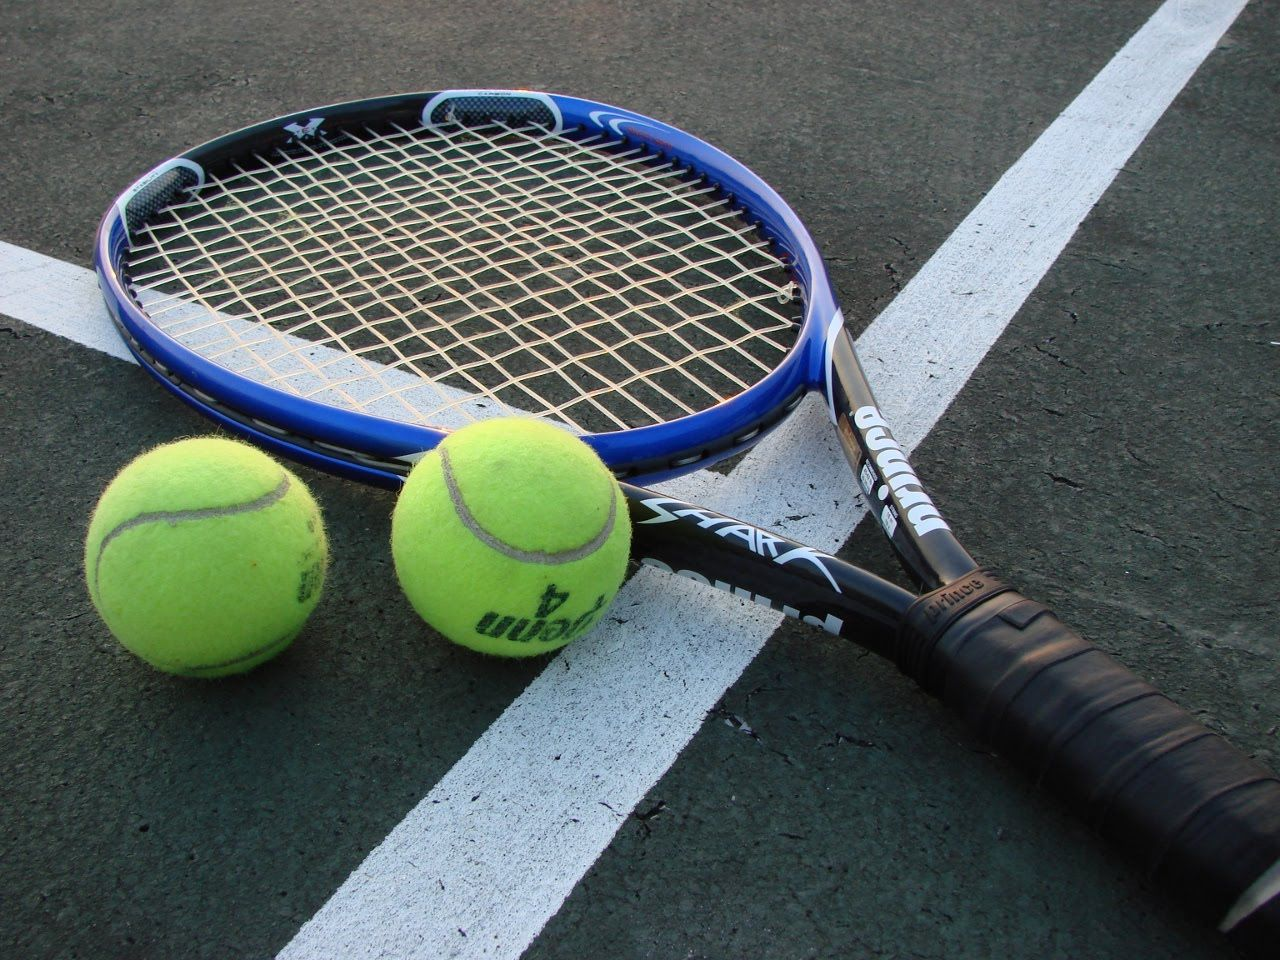 rqueta de tenis